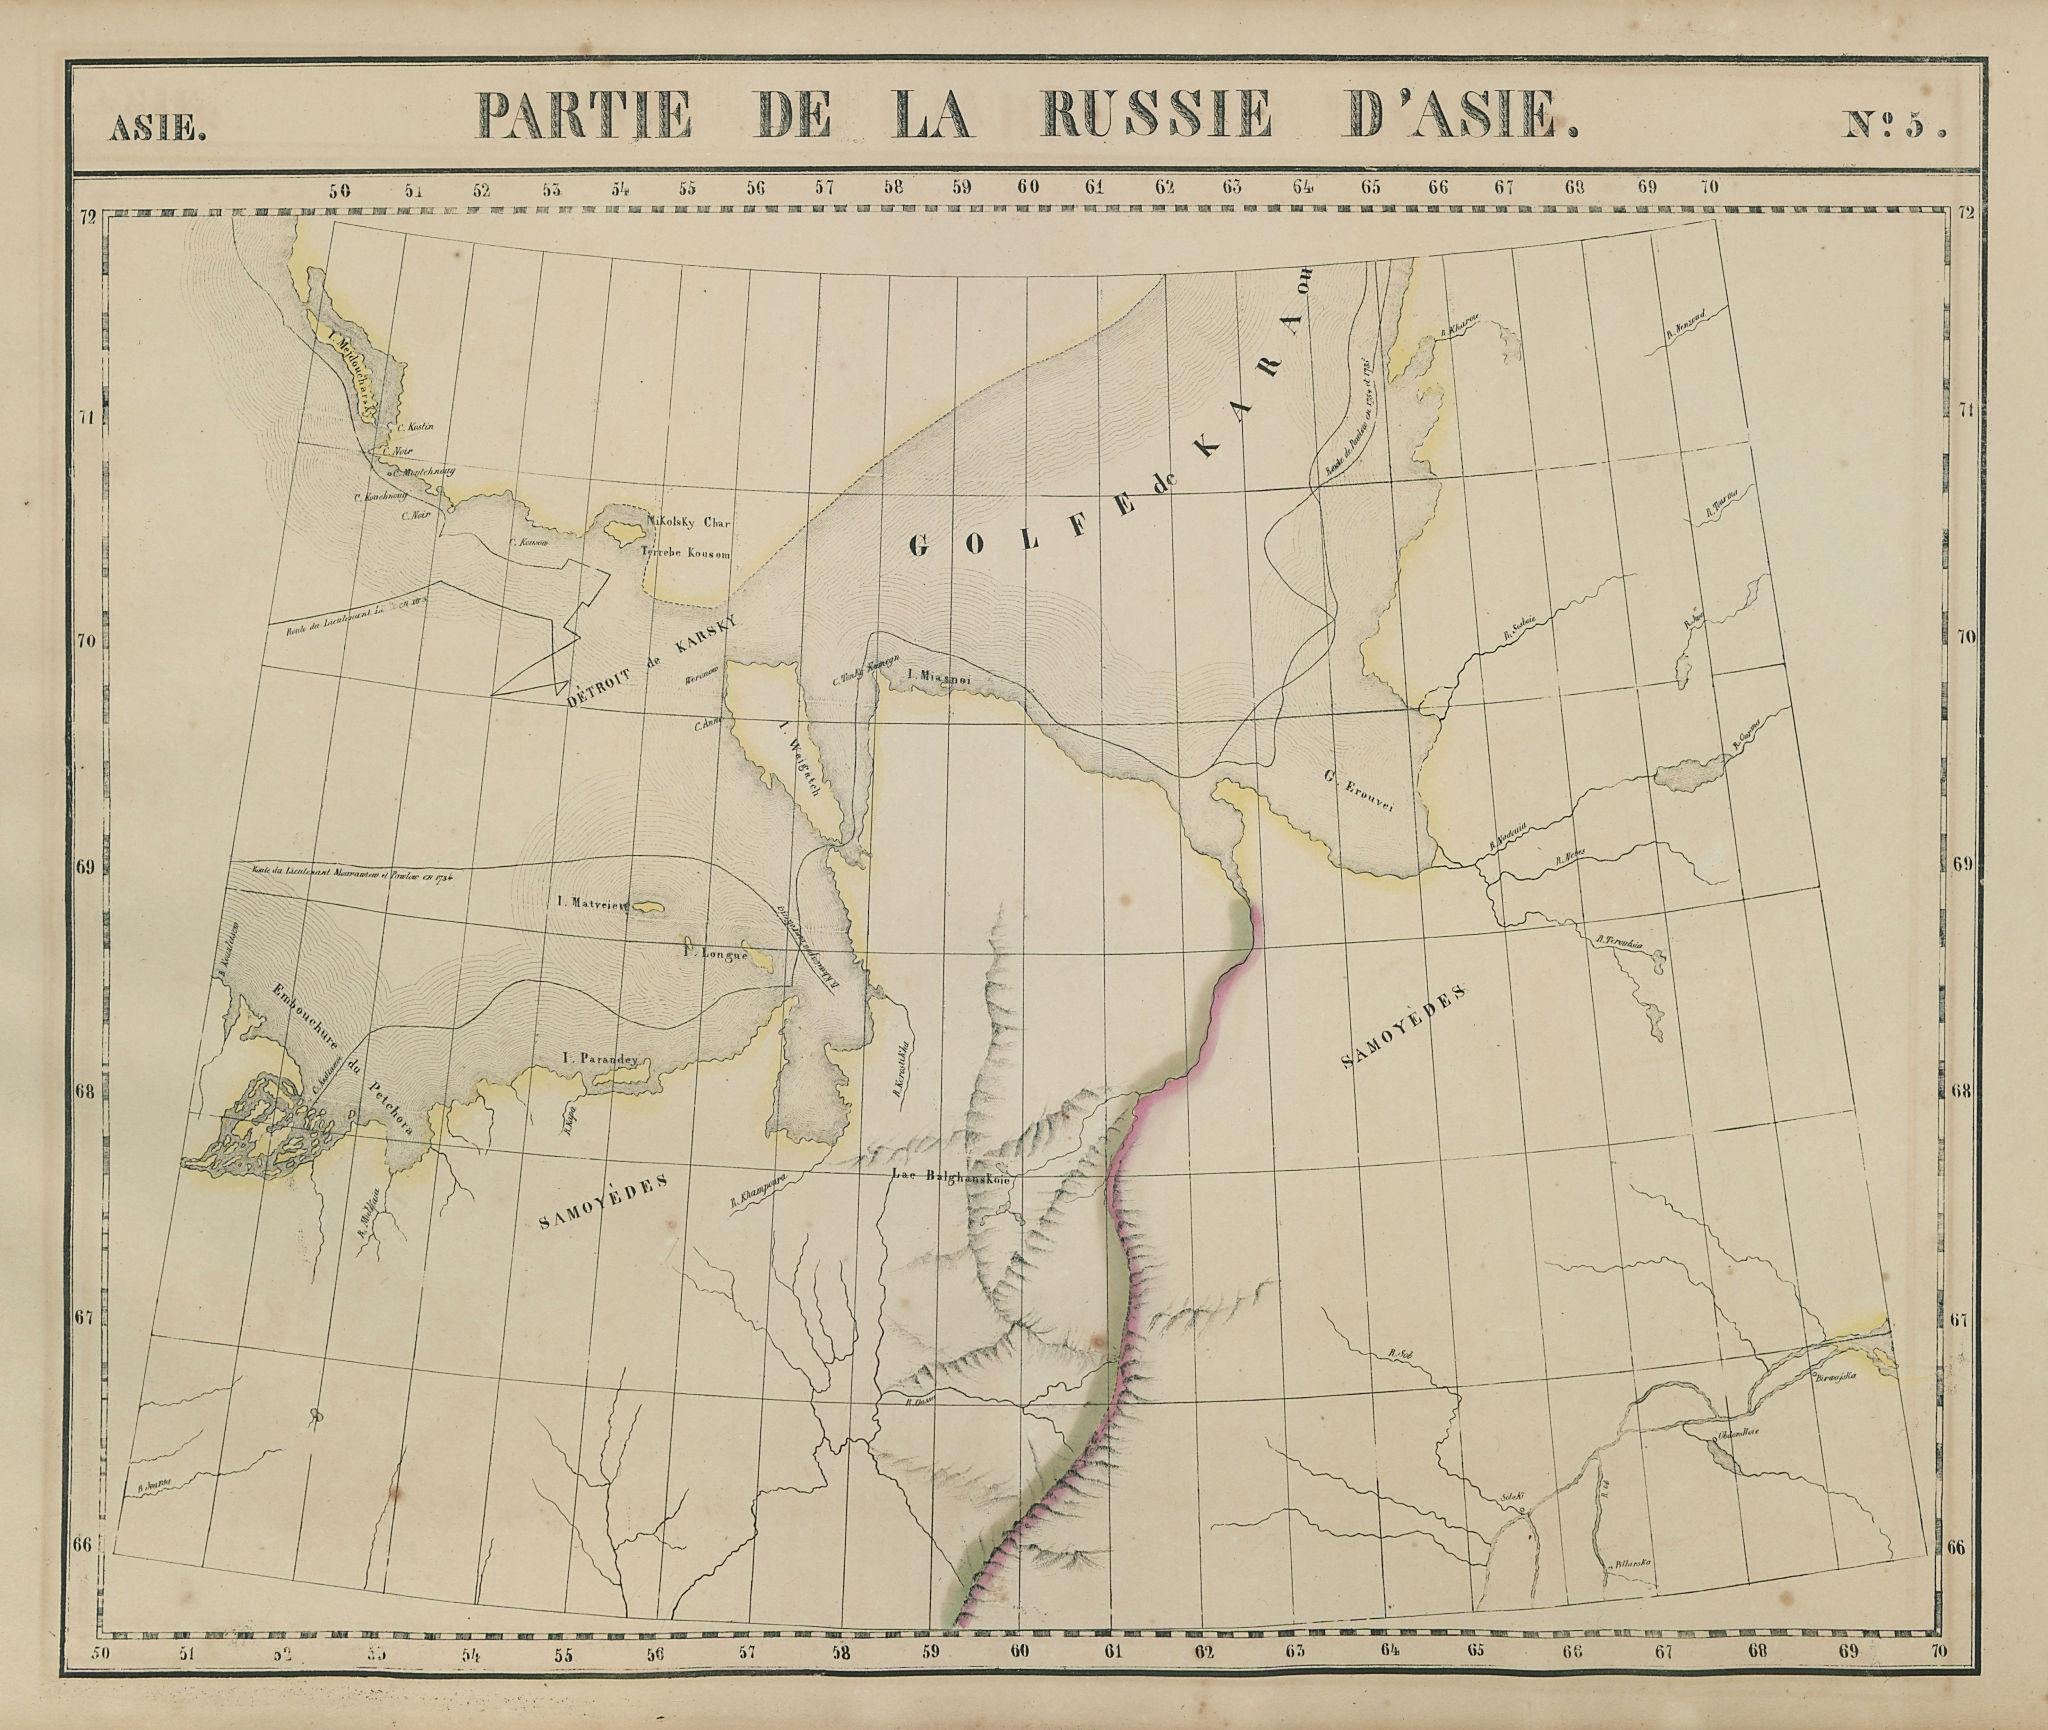 Russie d'Asie #5 Russia. Novaya Zemlya Nenetsia Yamalia. VANDERMAELEN 1827 map